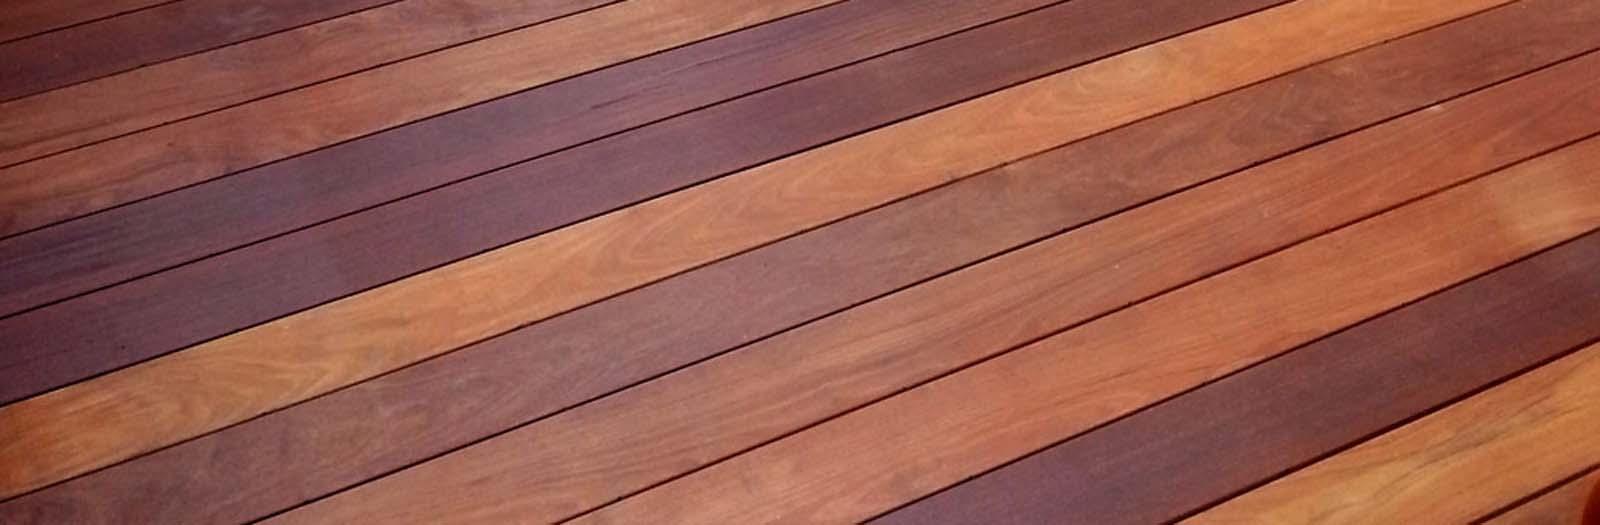 Brazilian Hardwood Decking Interior Trim Supply with regard to proportions 1600 X 525